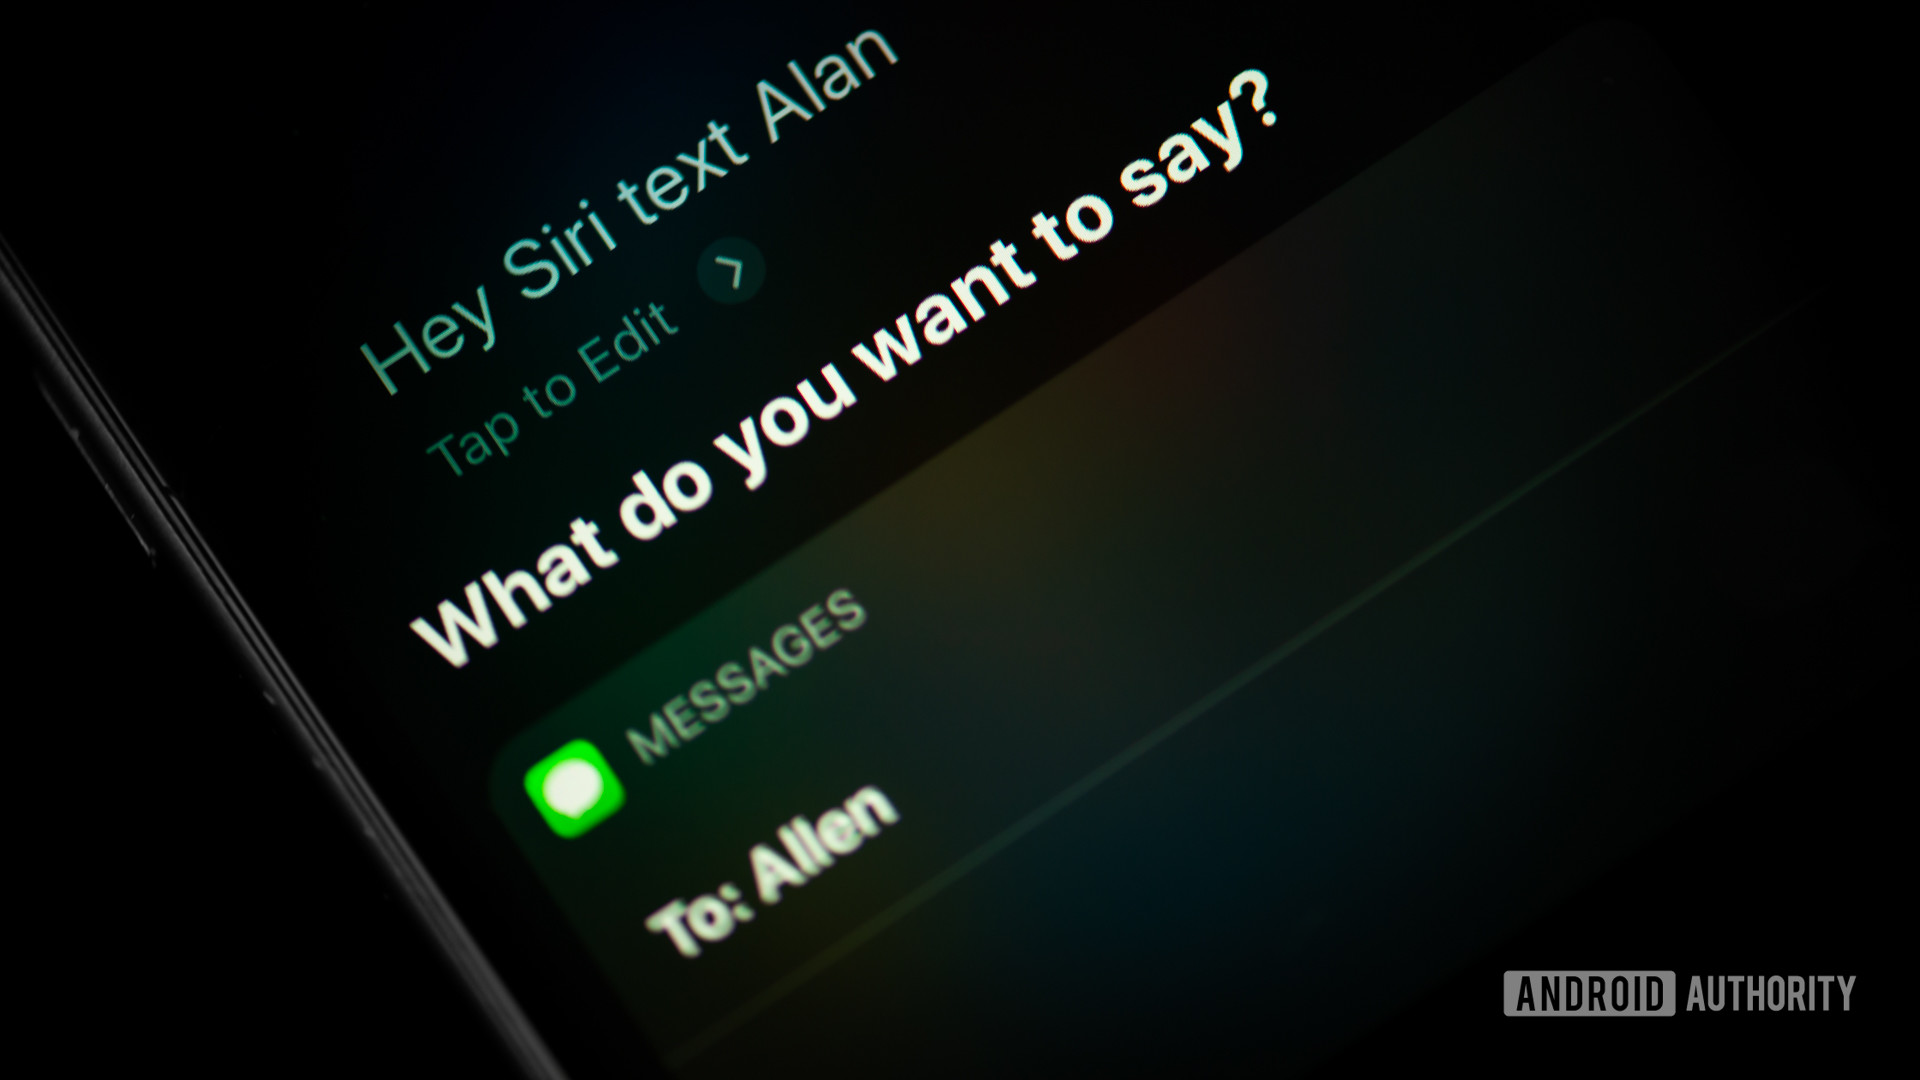 Siri command texting